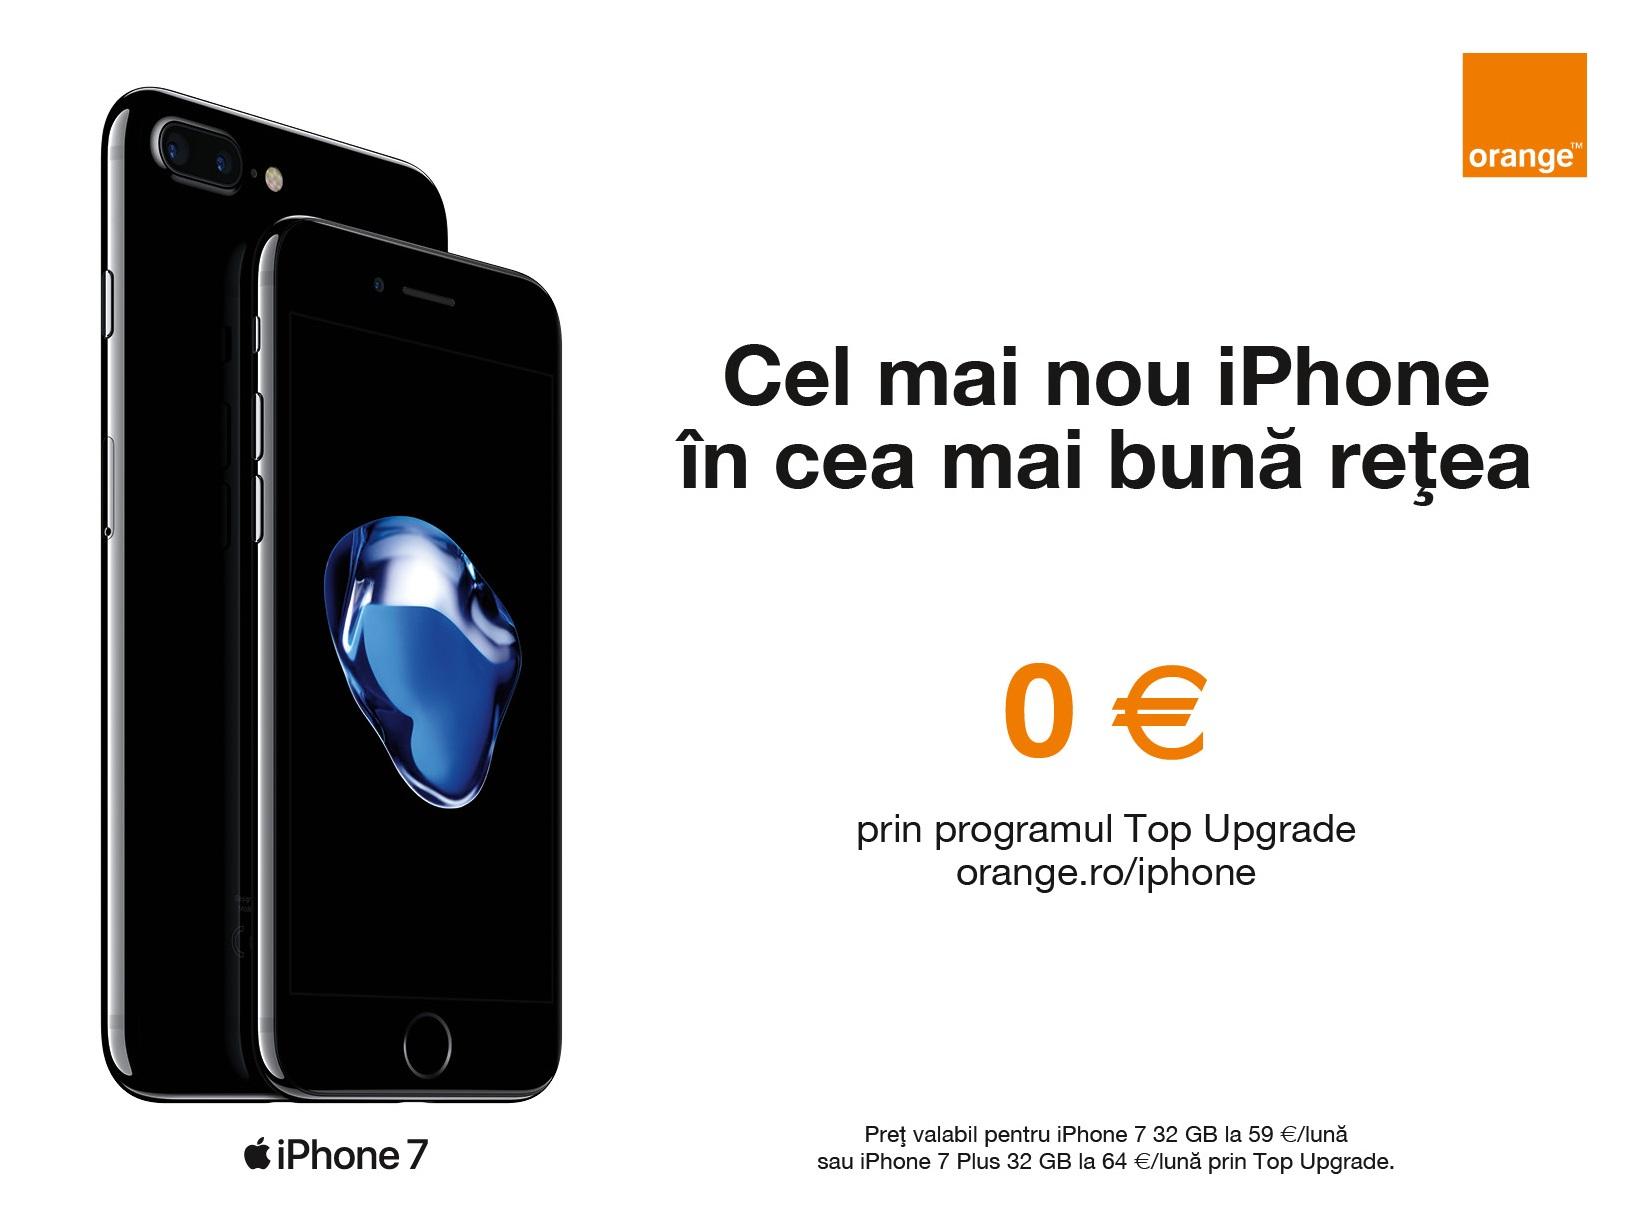 top-upgrade-chirie-iphone-orange